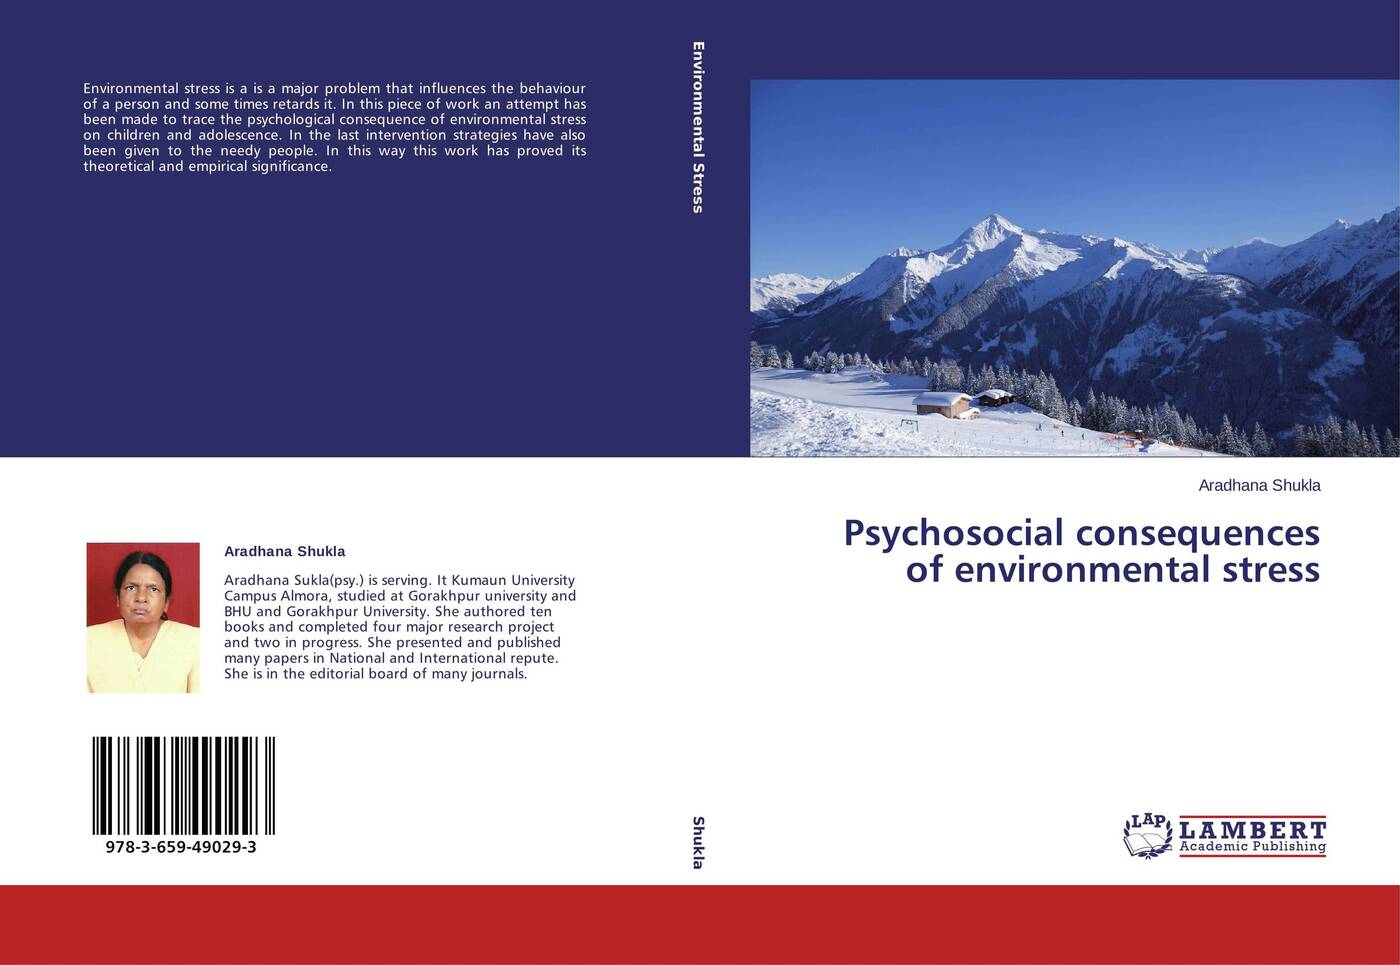 Aradhana Shukla Psychosocial consequences of environmental stress цена в Москве и Питере